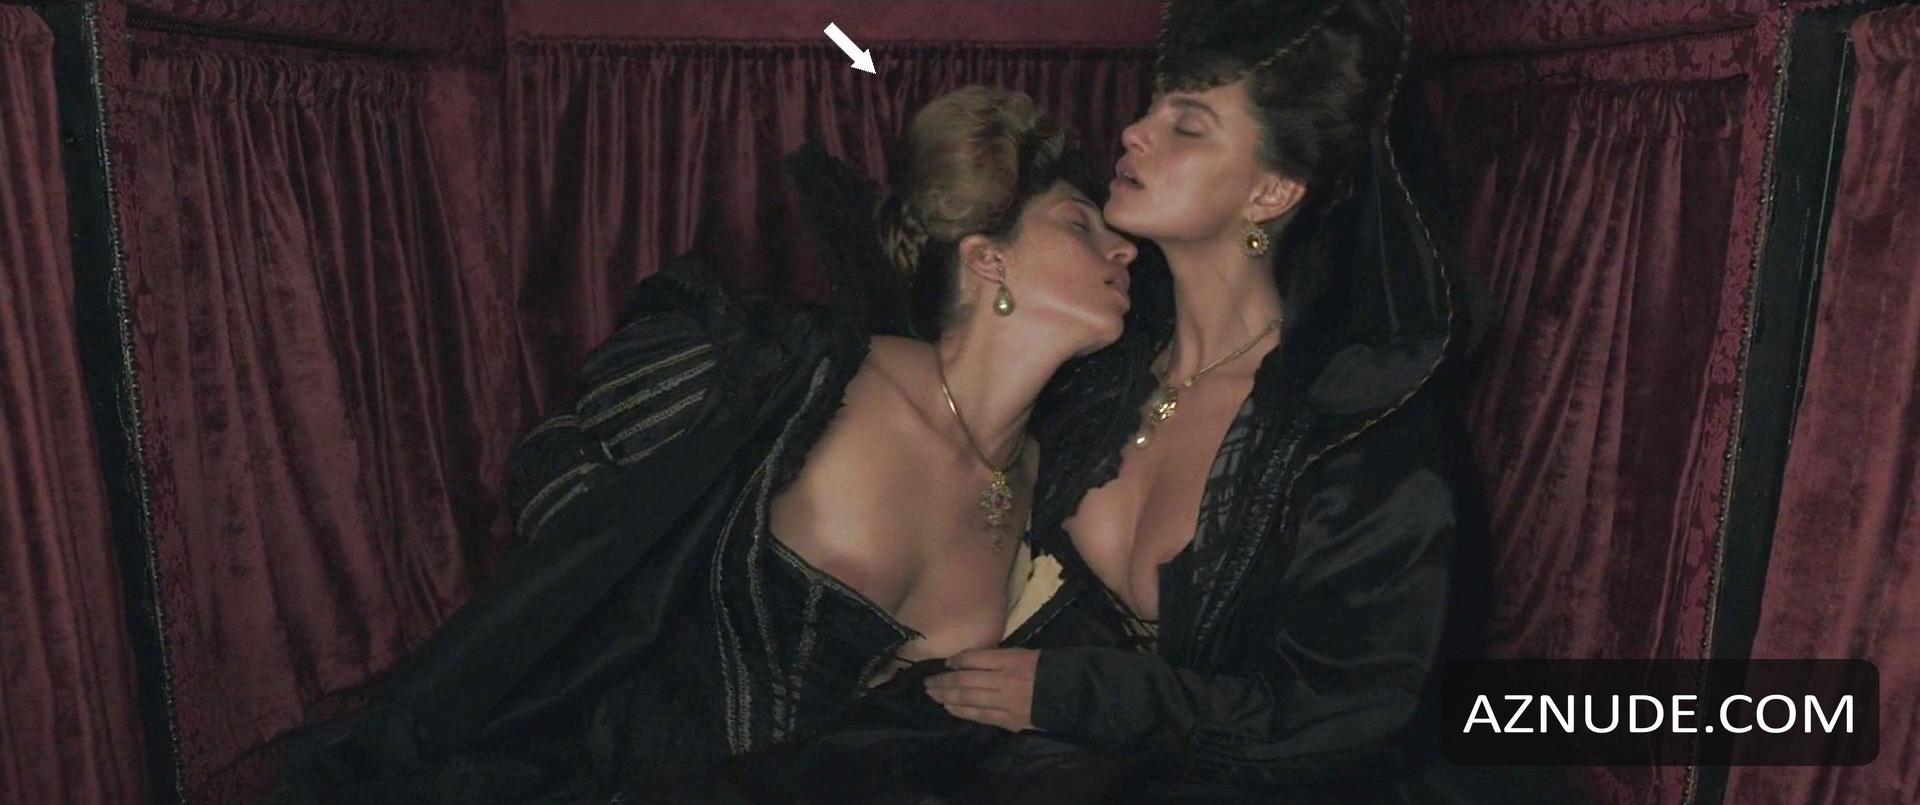 Cynthia Watros Topless Pretty browse celebrity two women images - page 34 - aznude